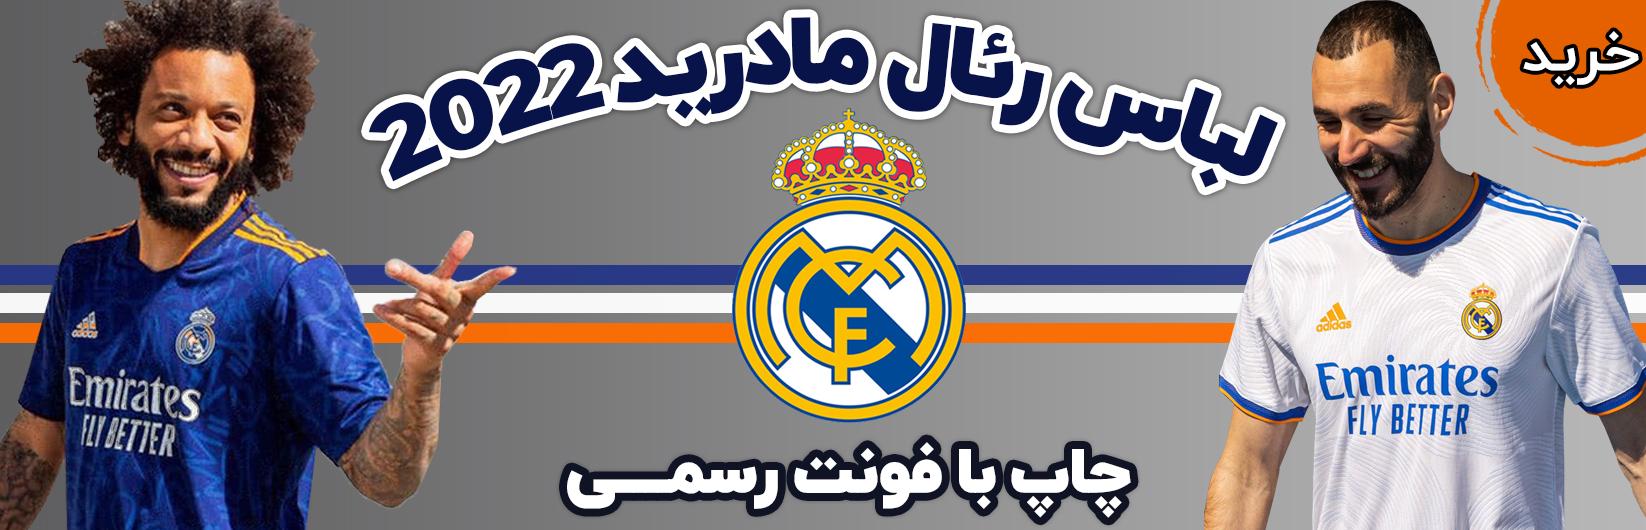 عکس دسته رئال مادرید